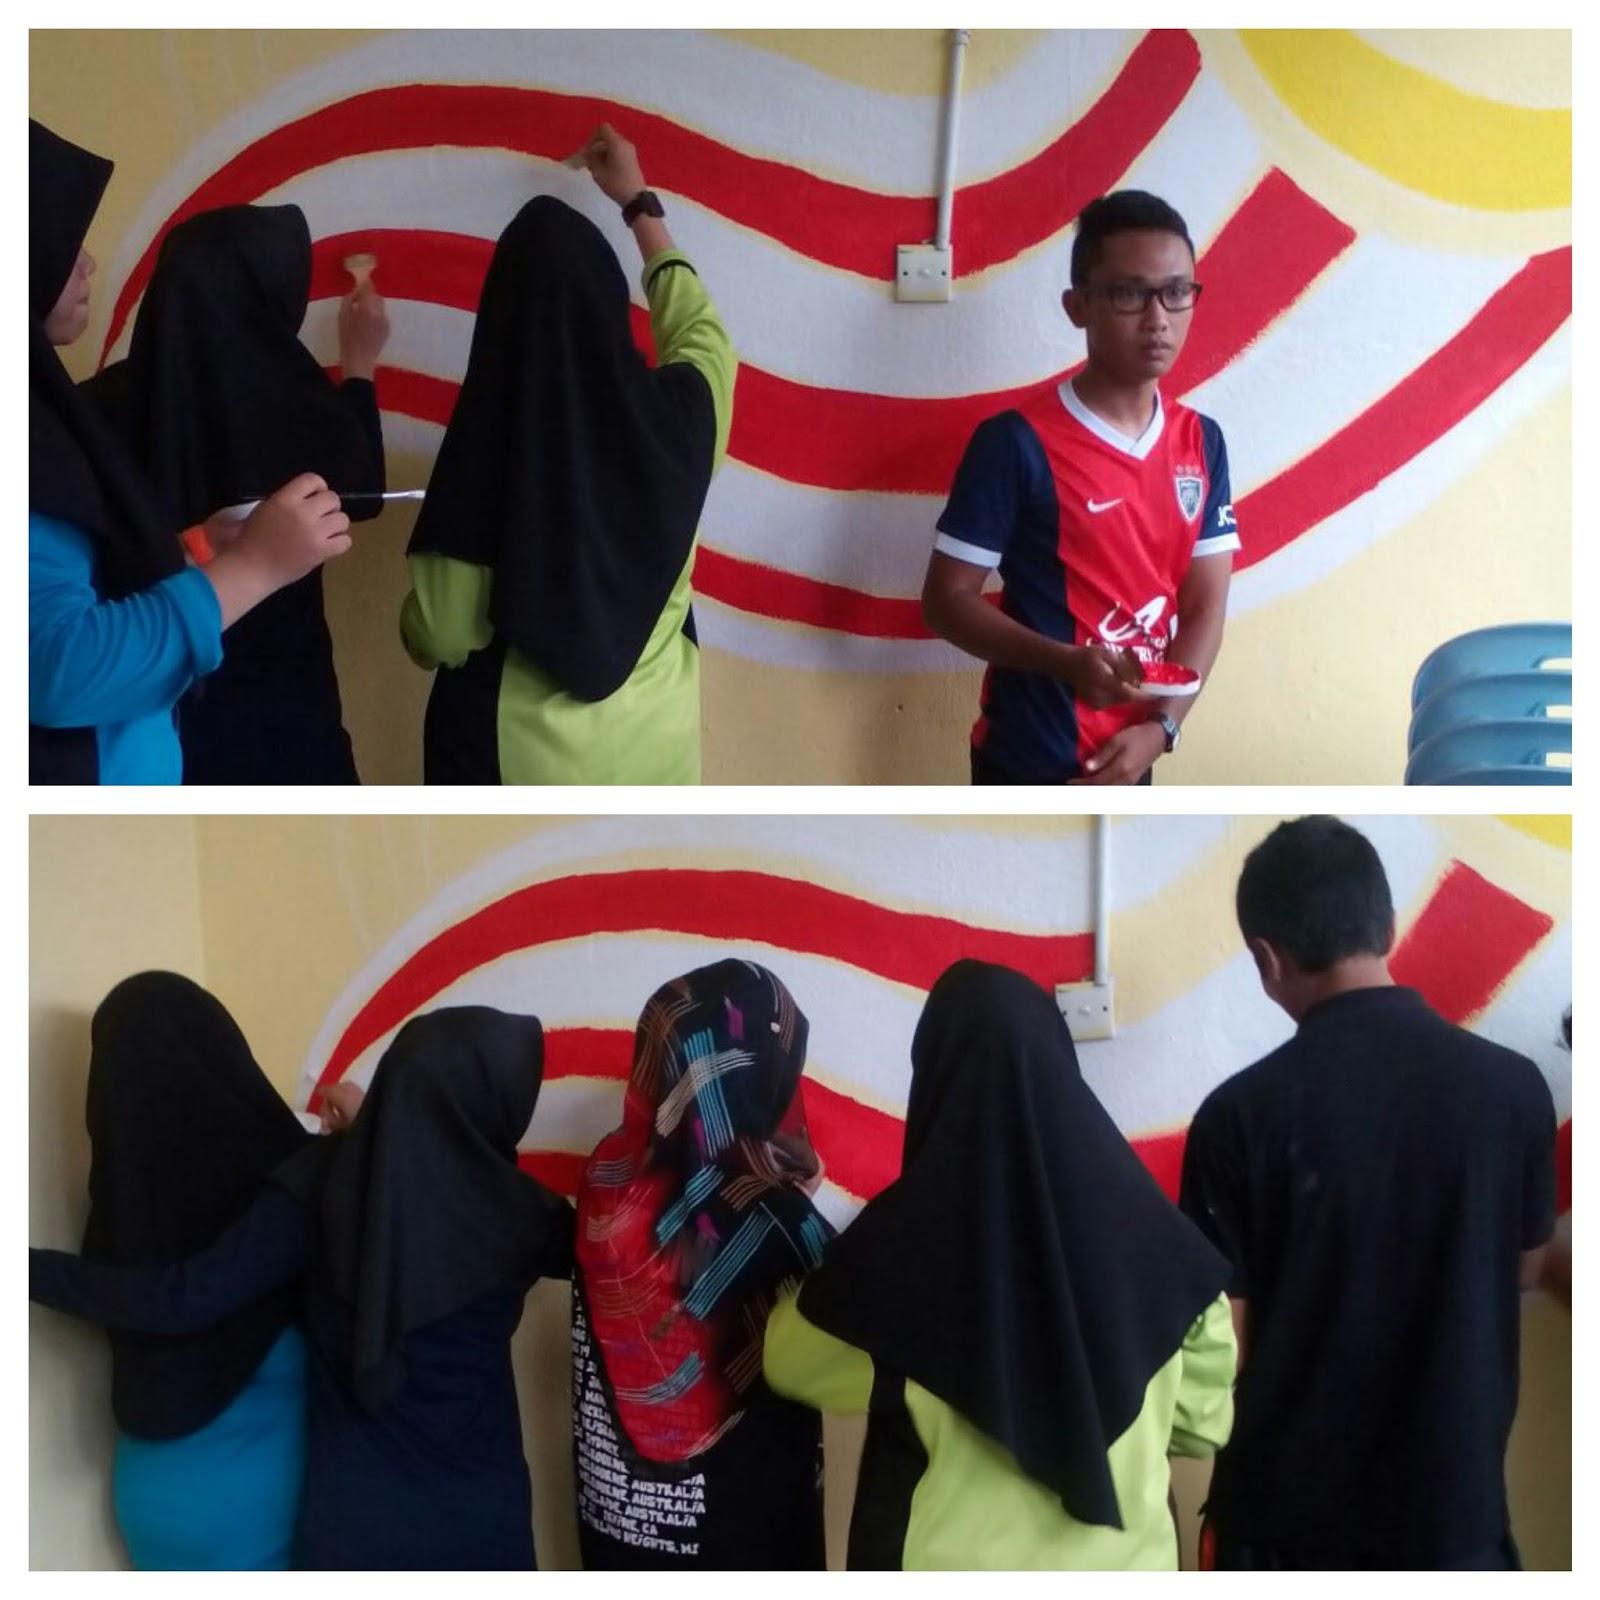 Smk lubok china hebat cemerlang kem aspirasi kelab 1 malaysia for Mural 1 malaysia